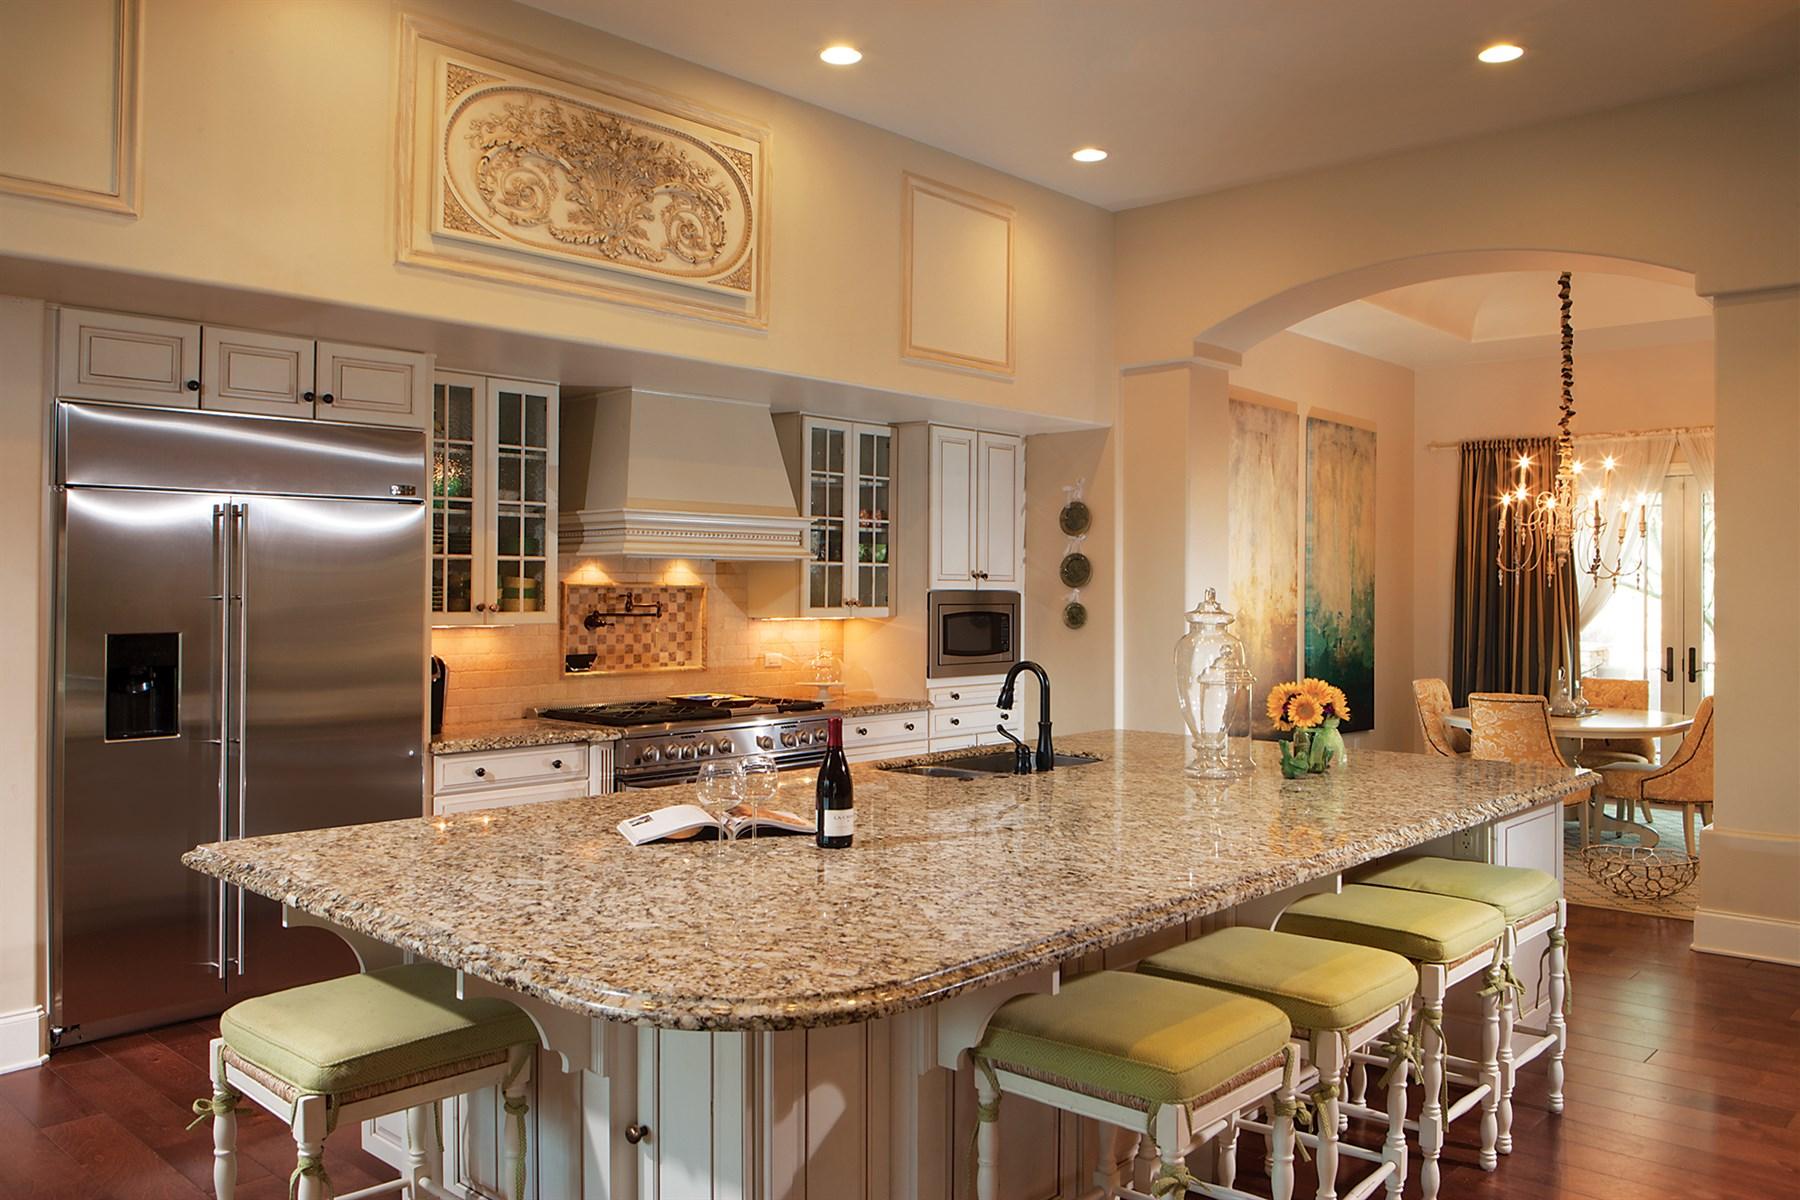 獨棟家庭住宅 為 出售 在 Incredible home tucked away in a friendly neighborhood 10050 N 58th Pl Paradise Valley, 亞利桑那州, 85253 美國